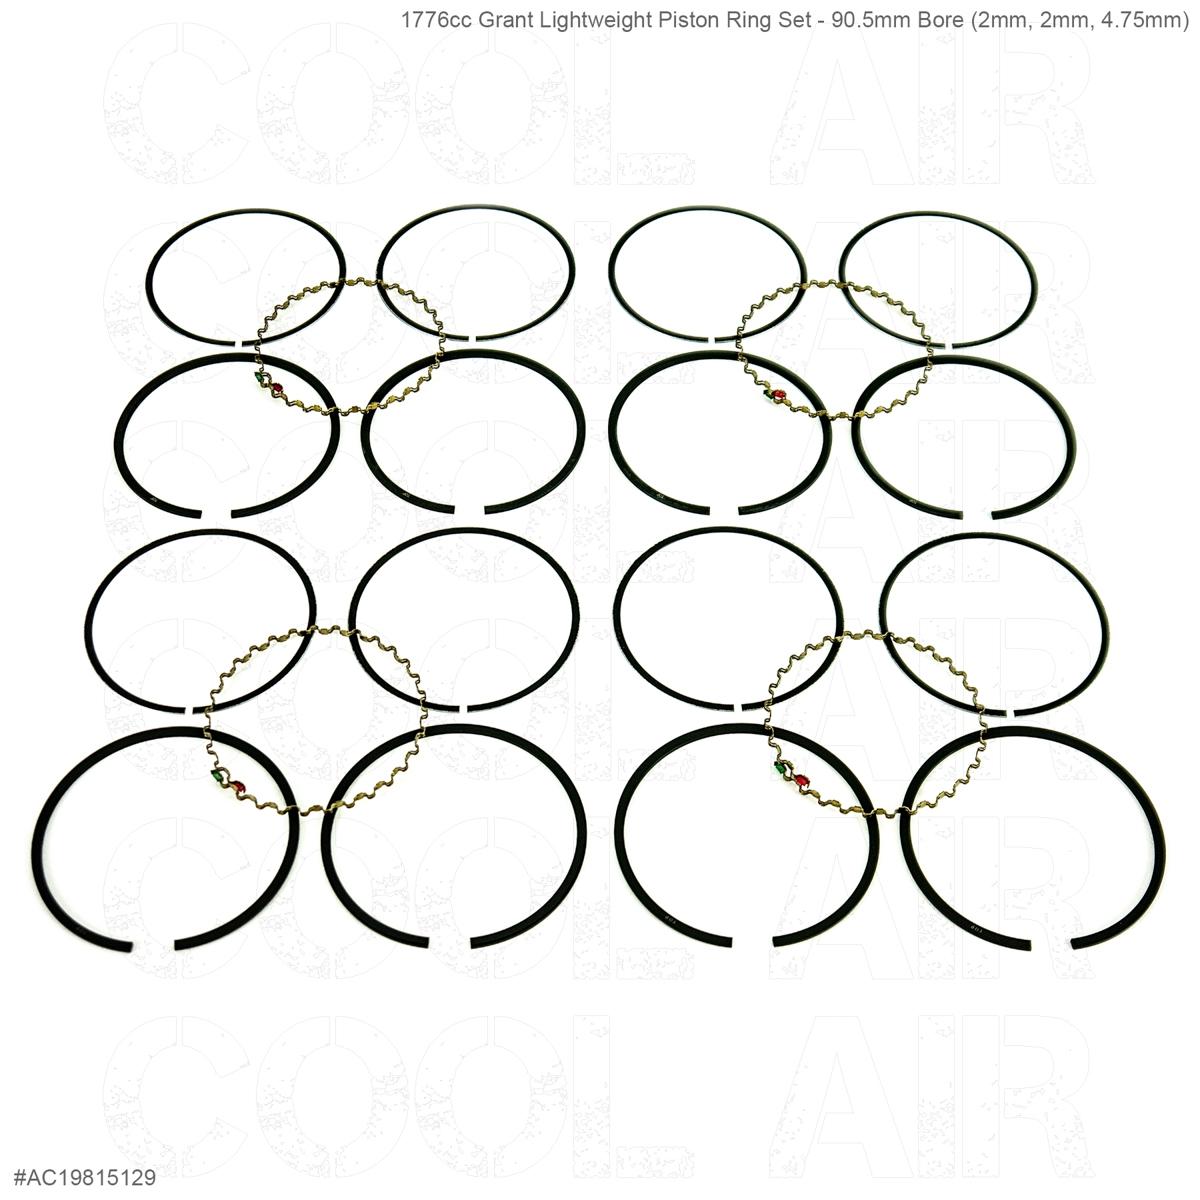 1776cc Grant Lightweight Piston Ring Set - 90.5mm Bore (2mm, 2mm, 4.75mm)